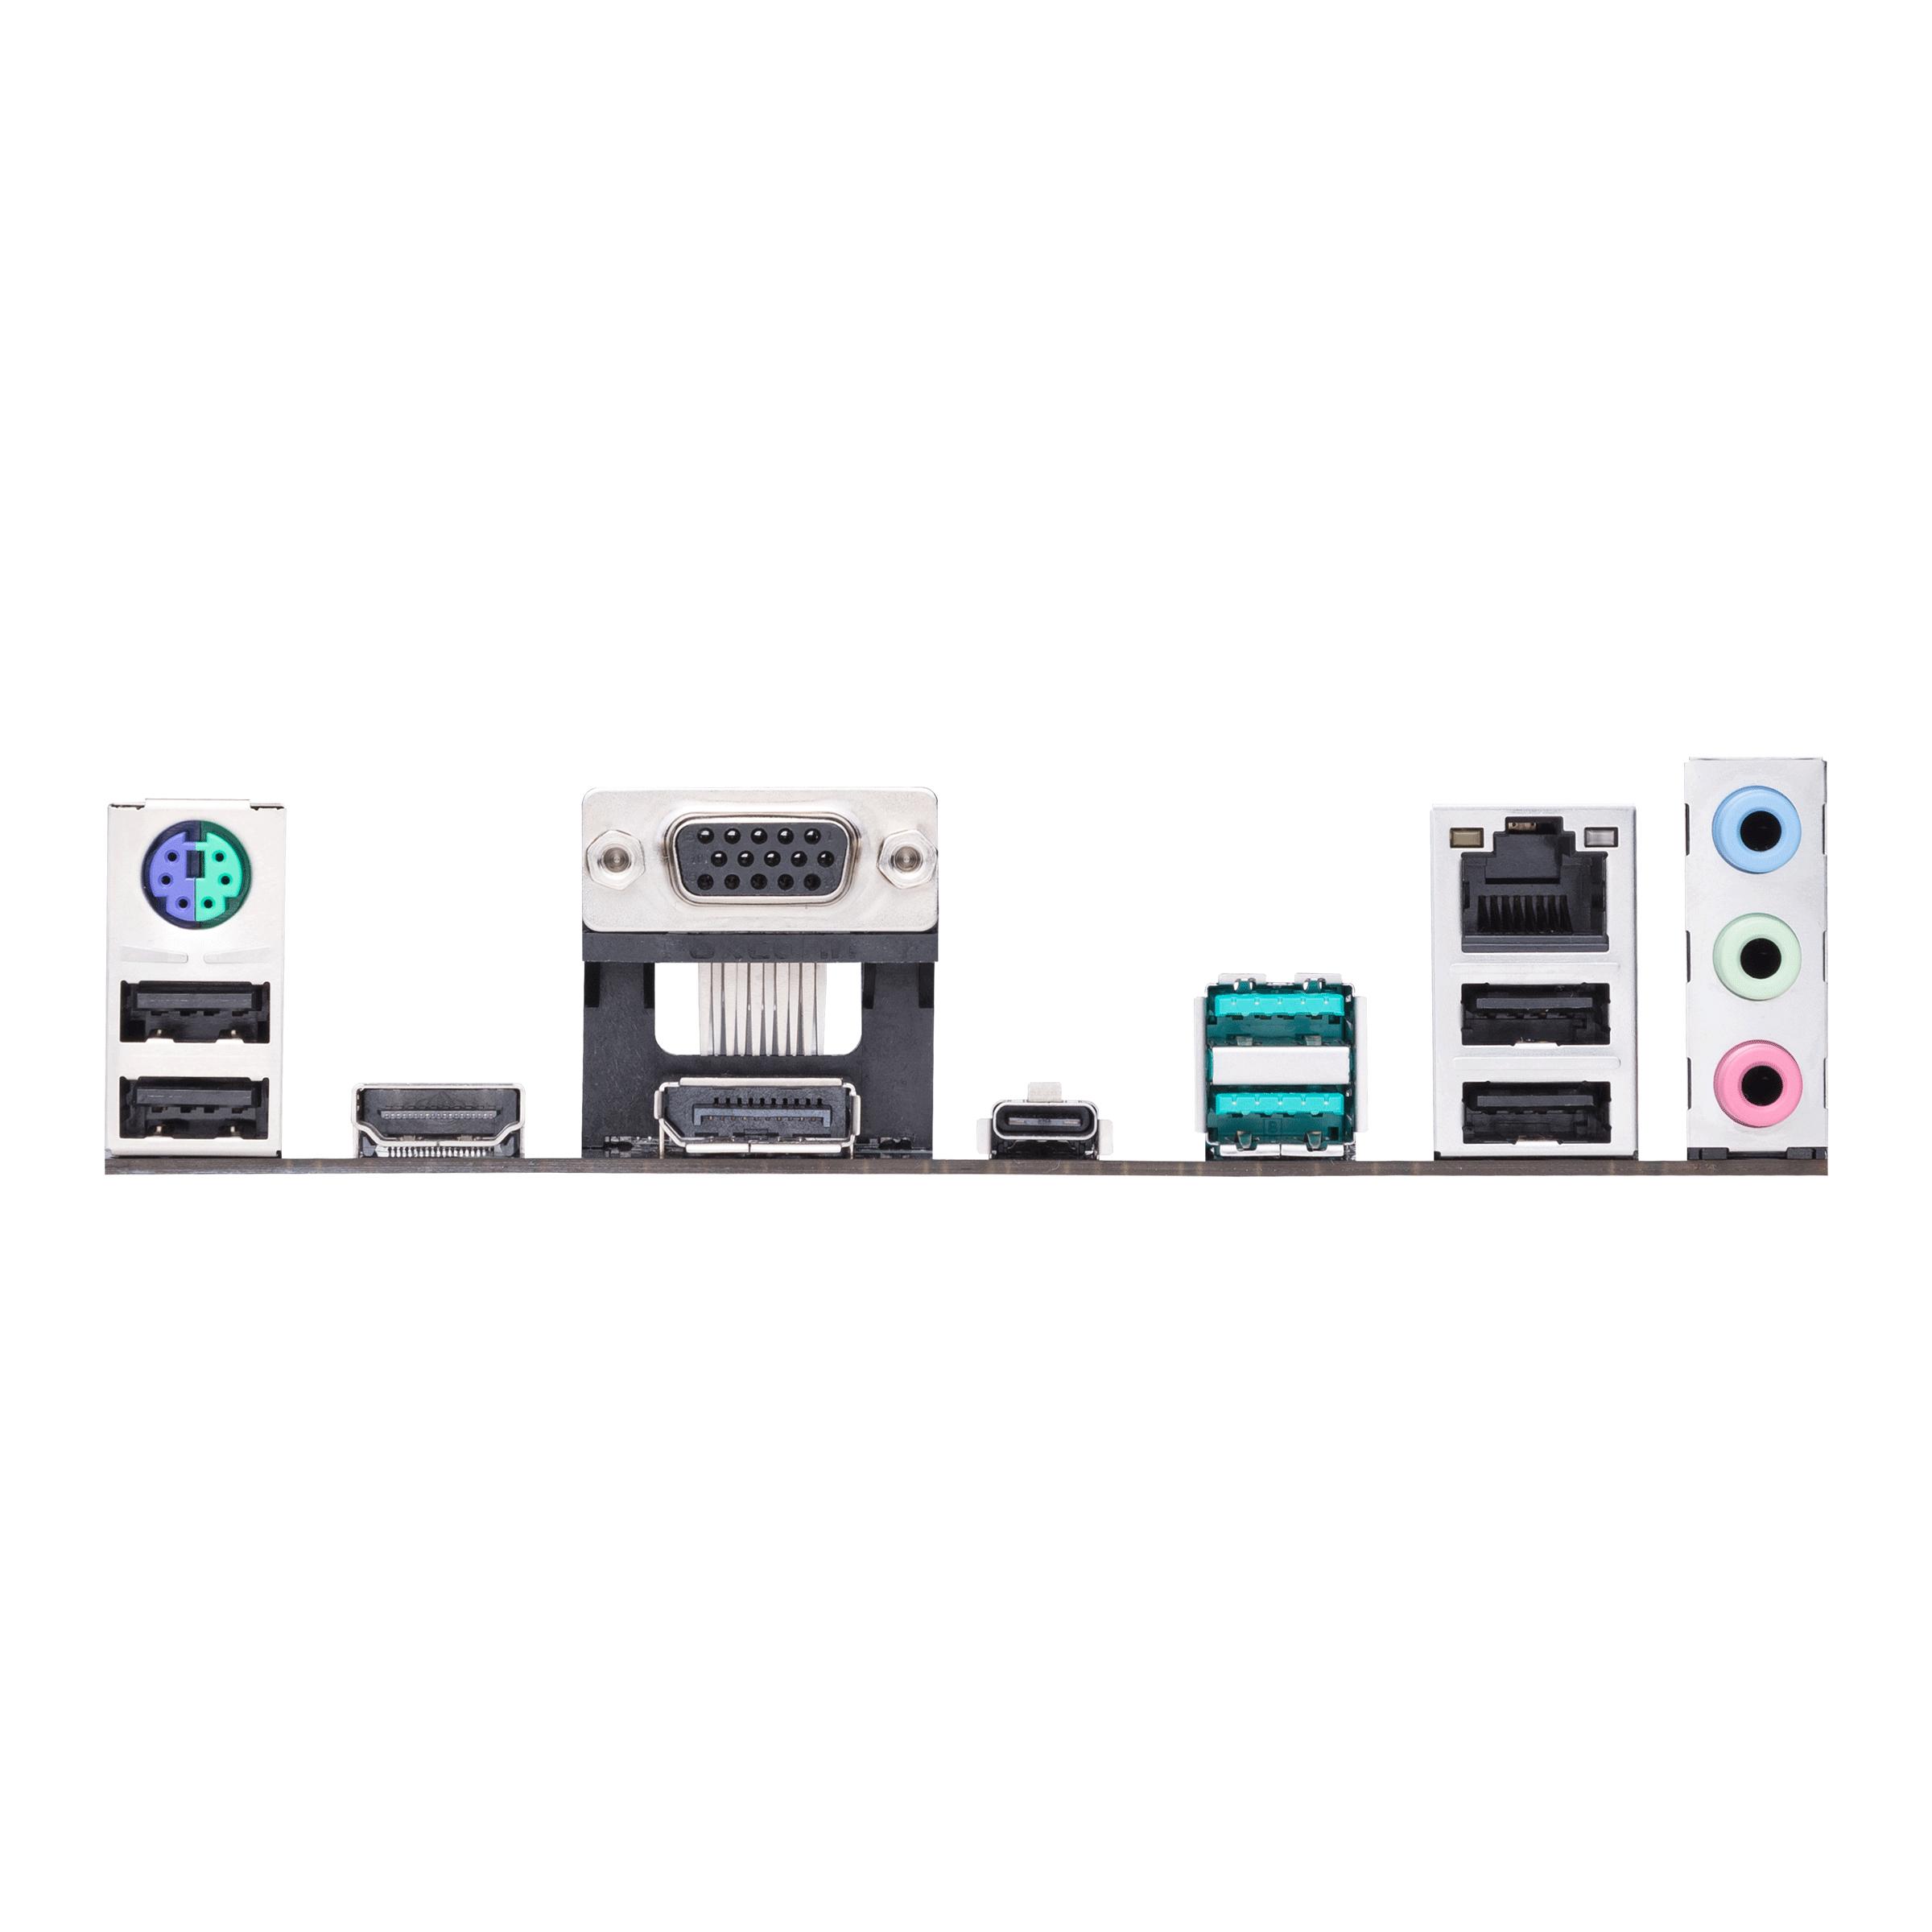 ASUS PRIME B560-PLUS - Motherboard - ATX - LGA1200-Sockel - B560 - USB-C Gen1, USB 3.2 Gen 1, USB 3.2 Gen 2 - Gigabit LAN - Onboard-Grafik (CPU erforderlich)